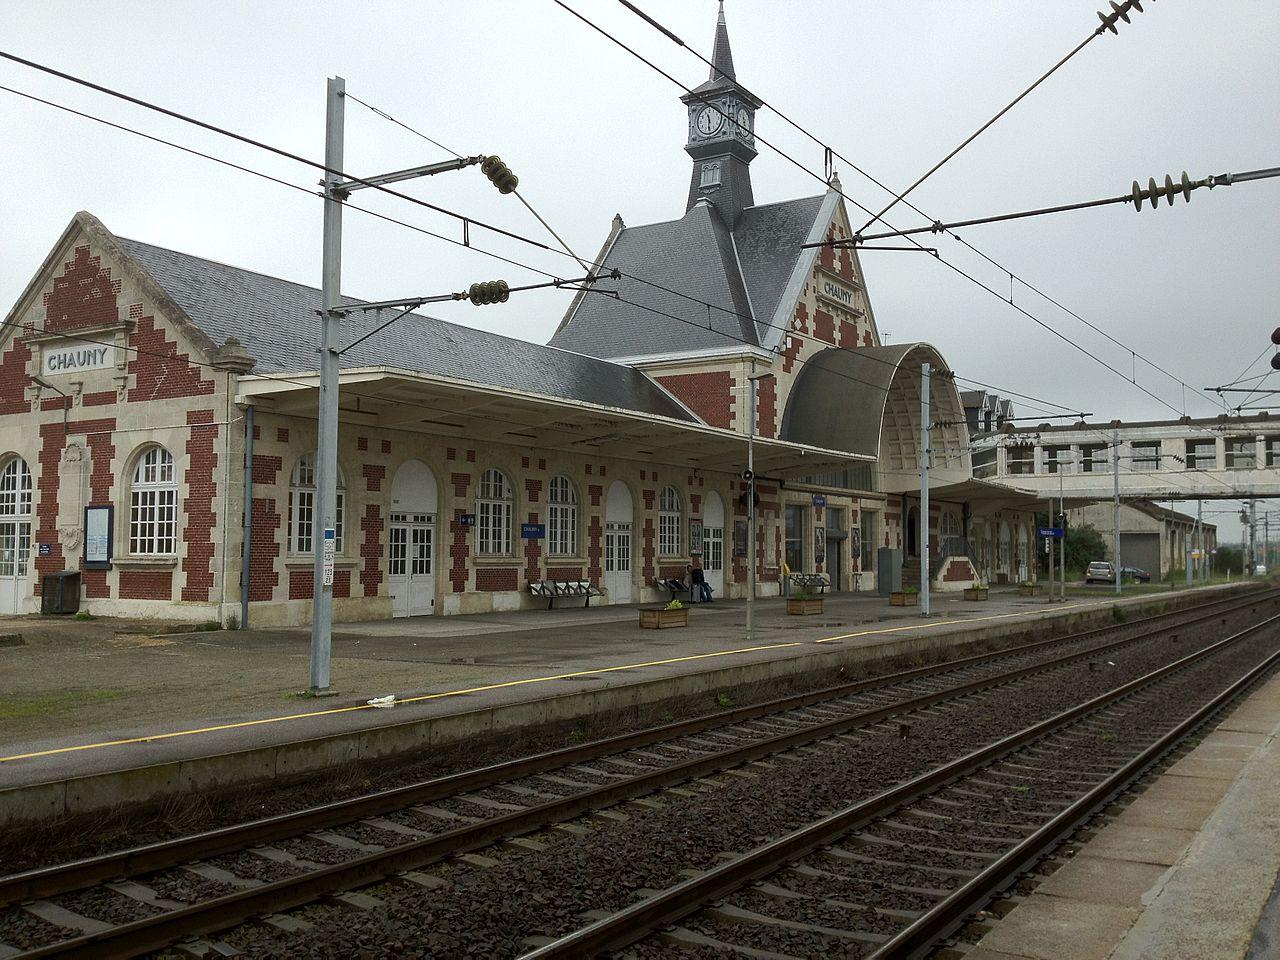 Chauny-train-station